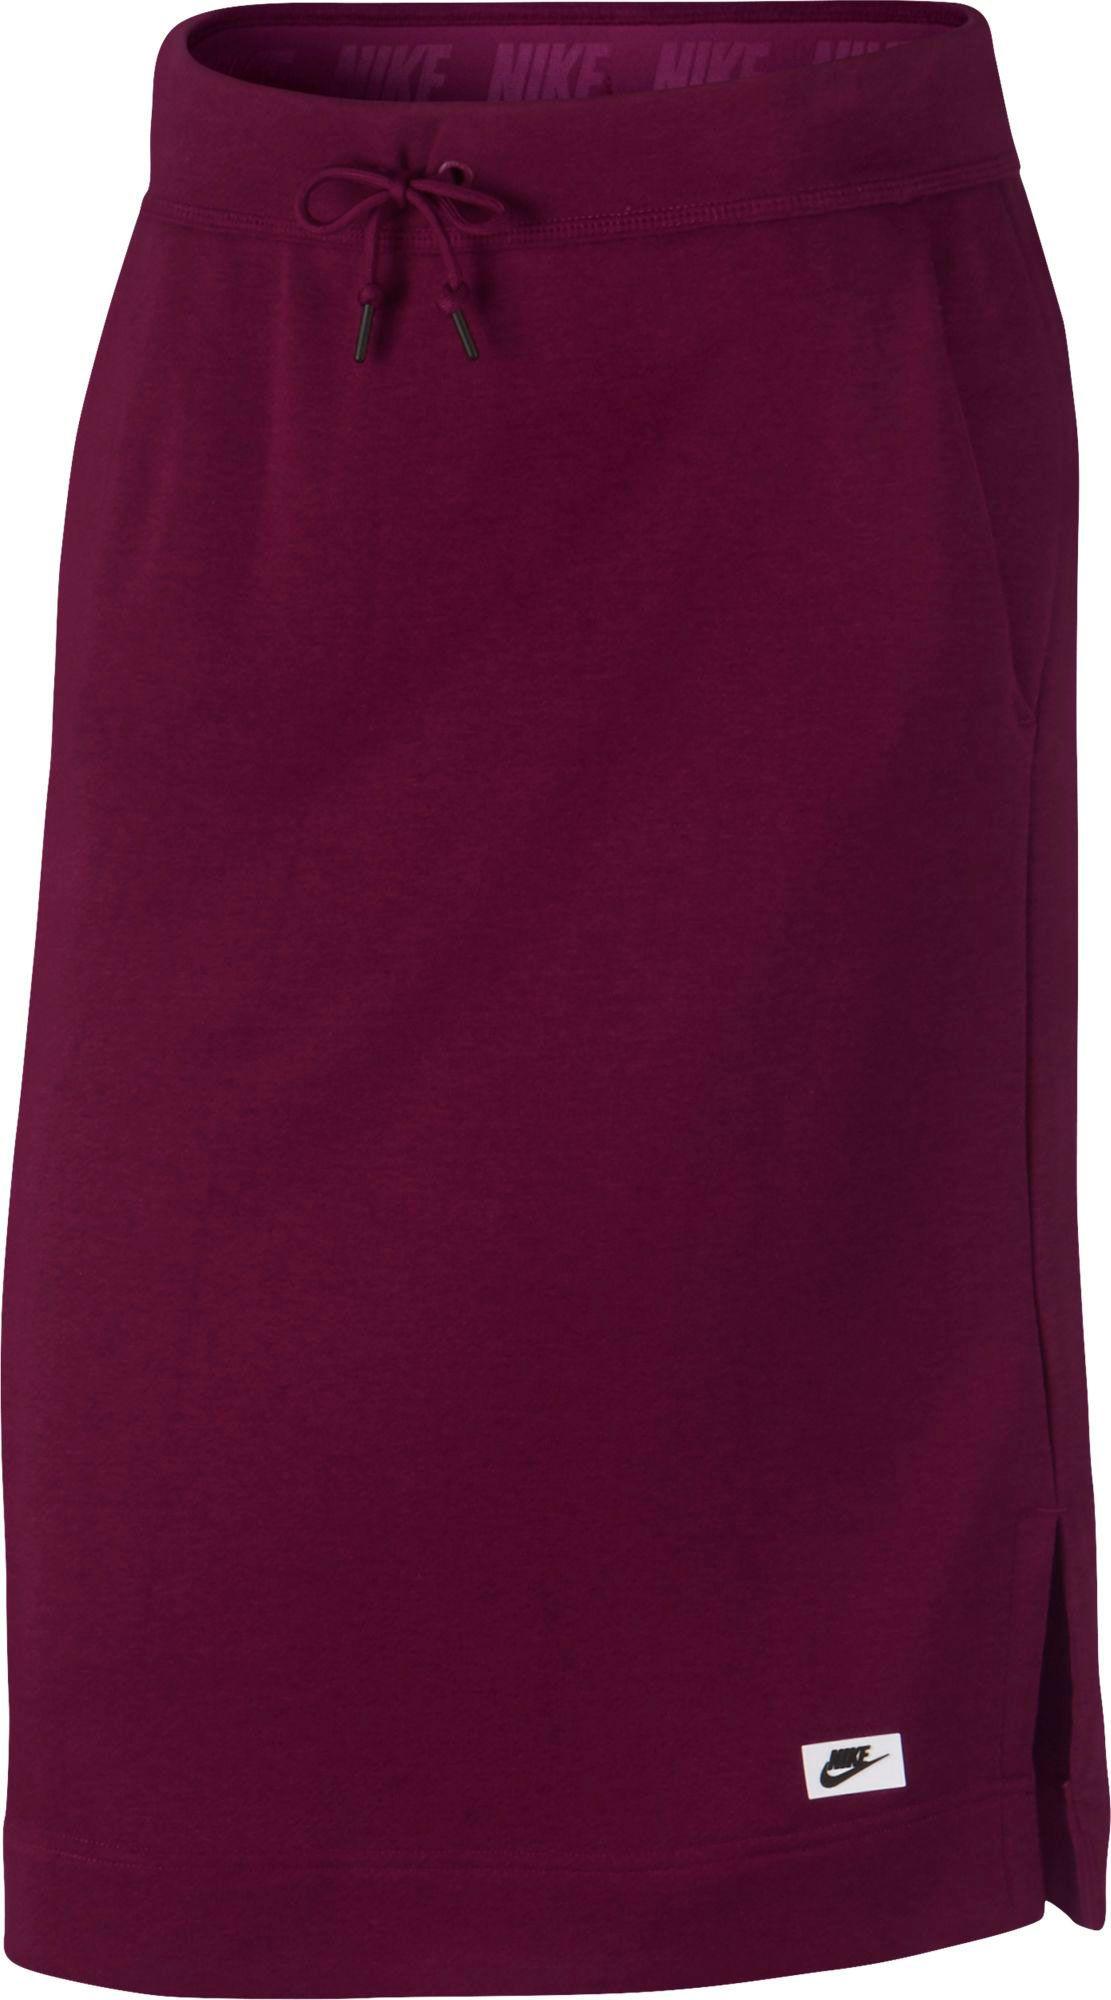 on sale f2dab 8e698 Nike Womens Sportswear Modern Skirt DICKS Sporting Goods hot sale 2017